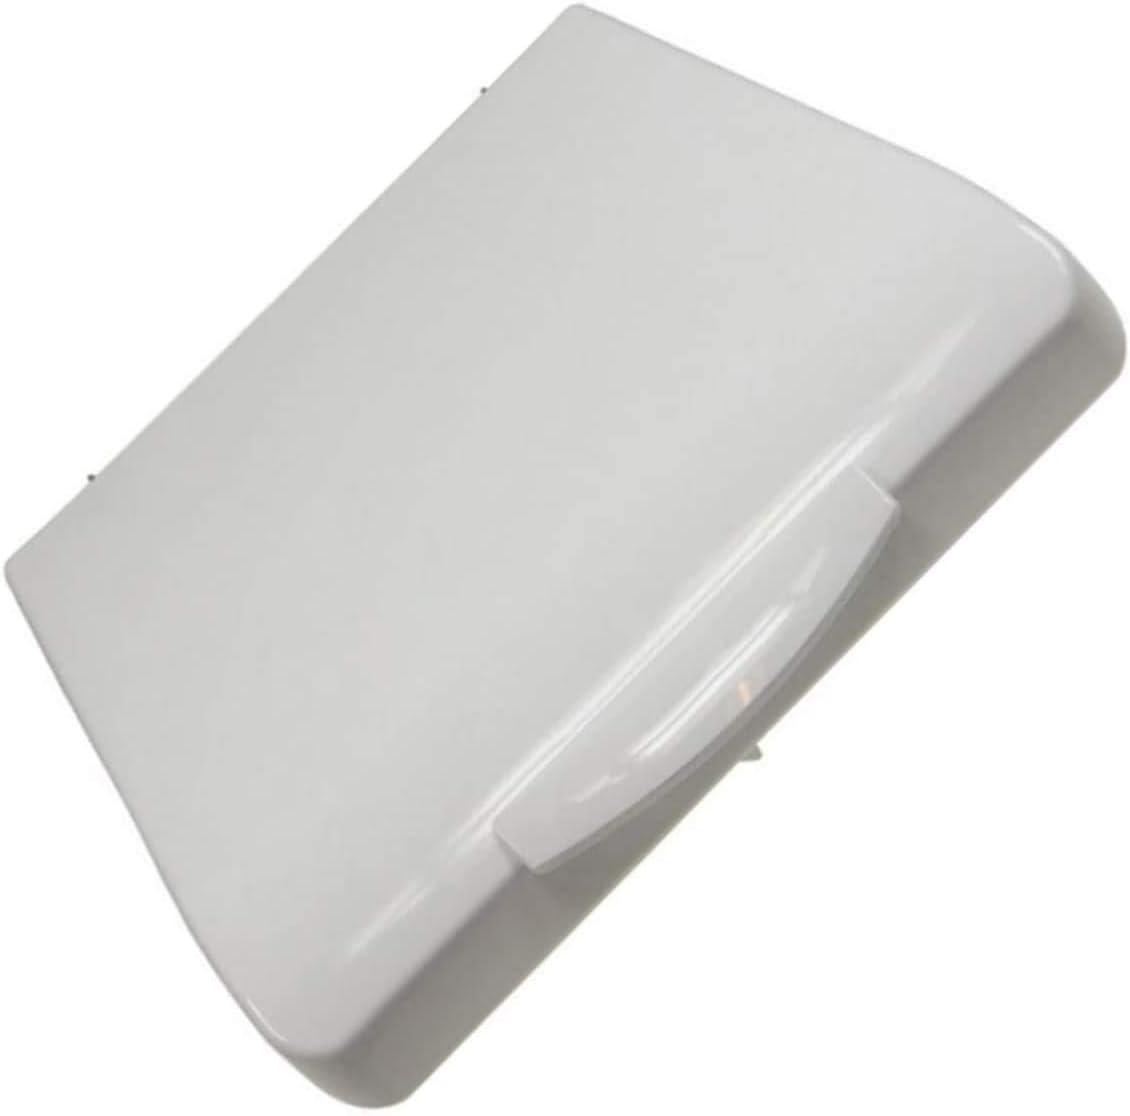 Tapa completa blanca para lavadora Zanussi, Faure, Bellavita, Curtiss, Essentiel B, Listo, Saba, Selecline, Highone, Aya.